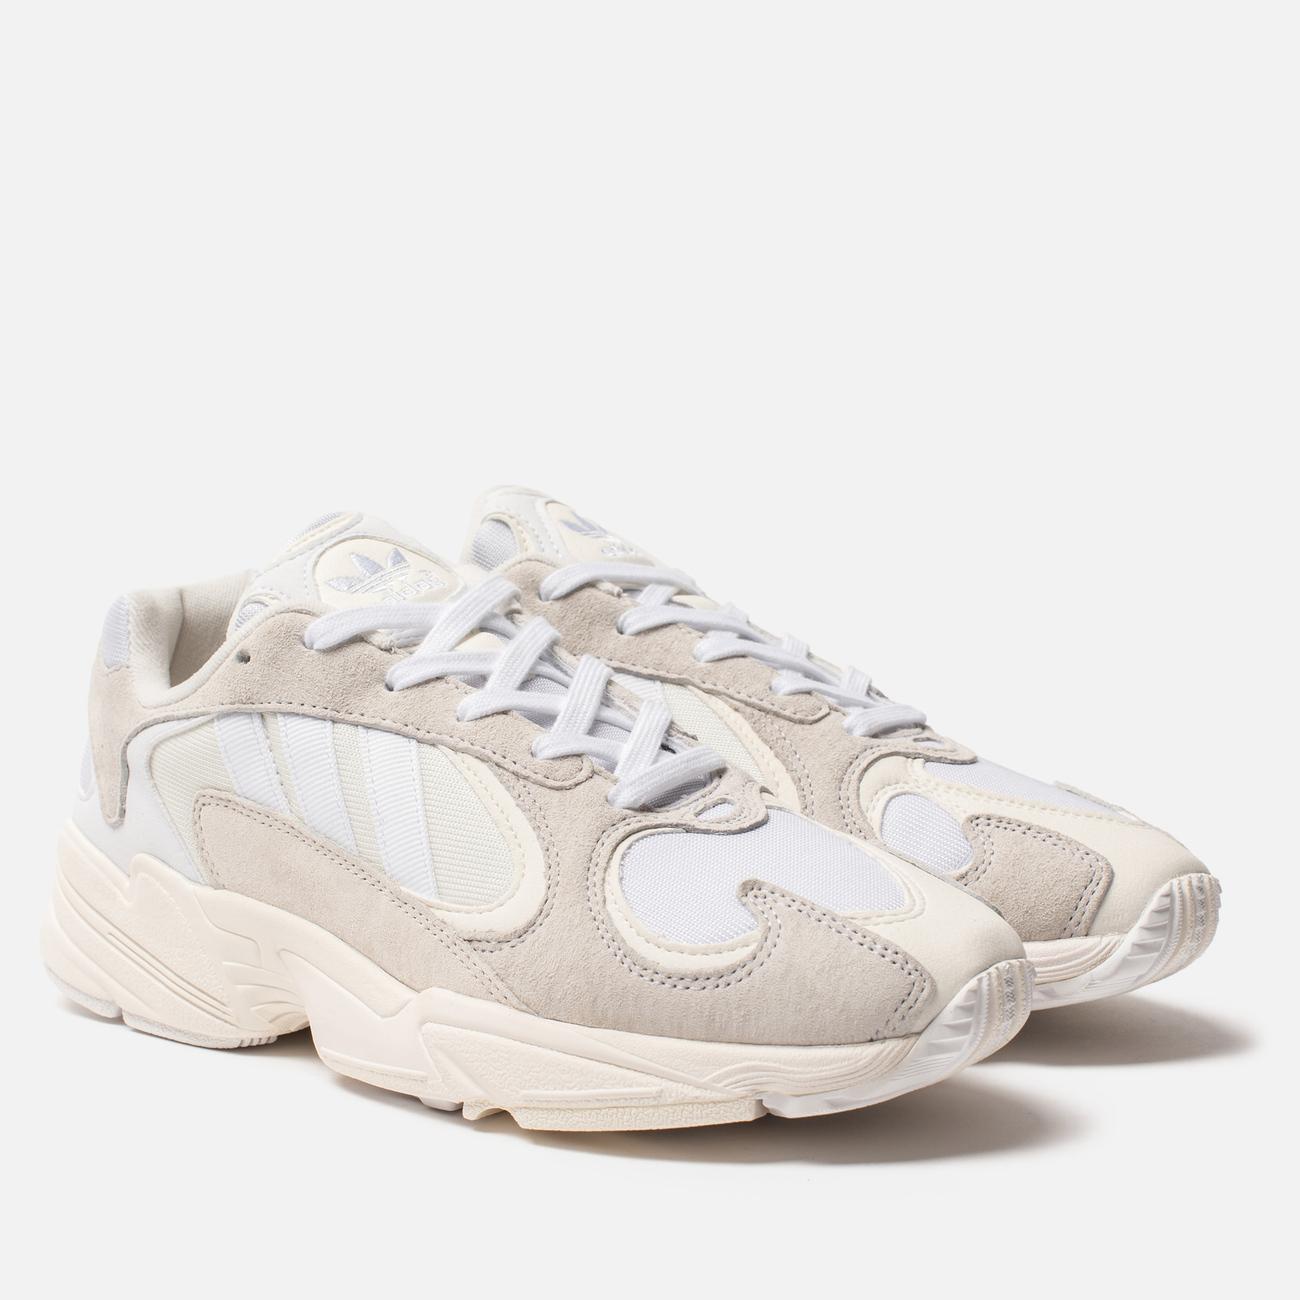 Кроссовки adidas Originals Yung-1 Cloud White/Cloud White/White